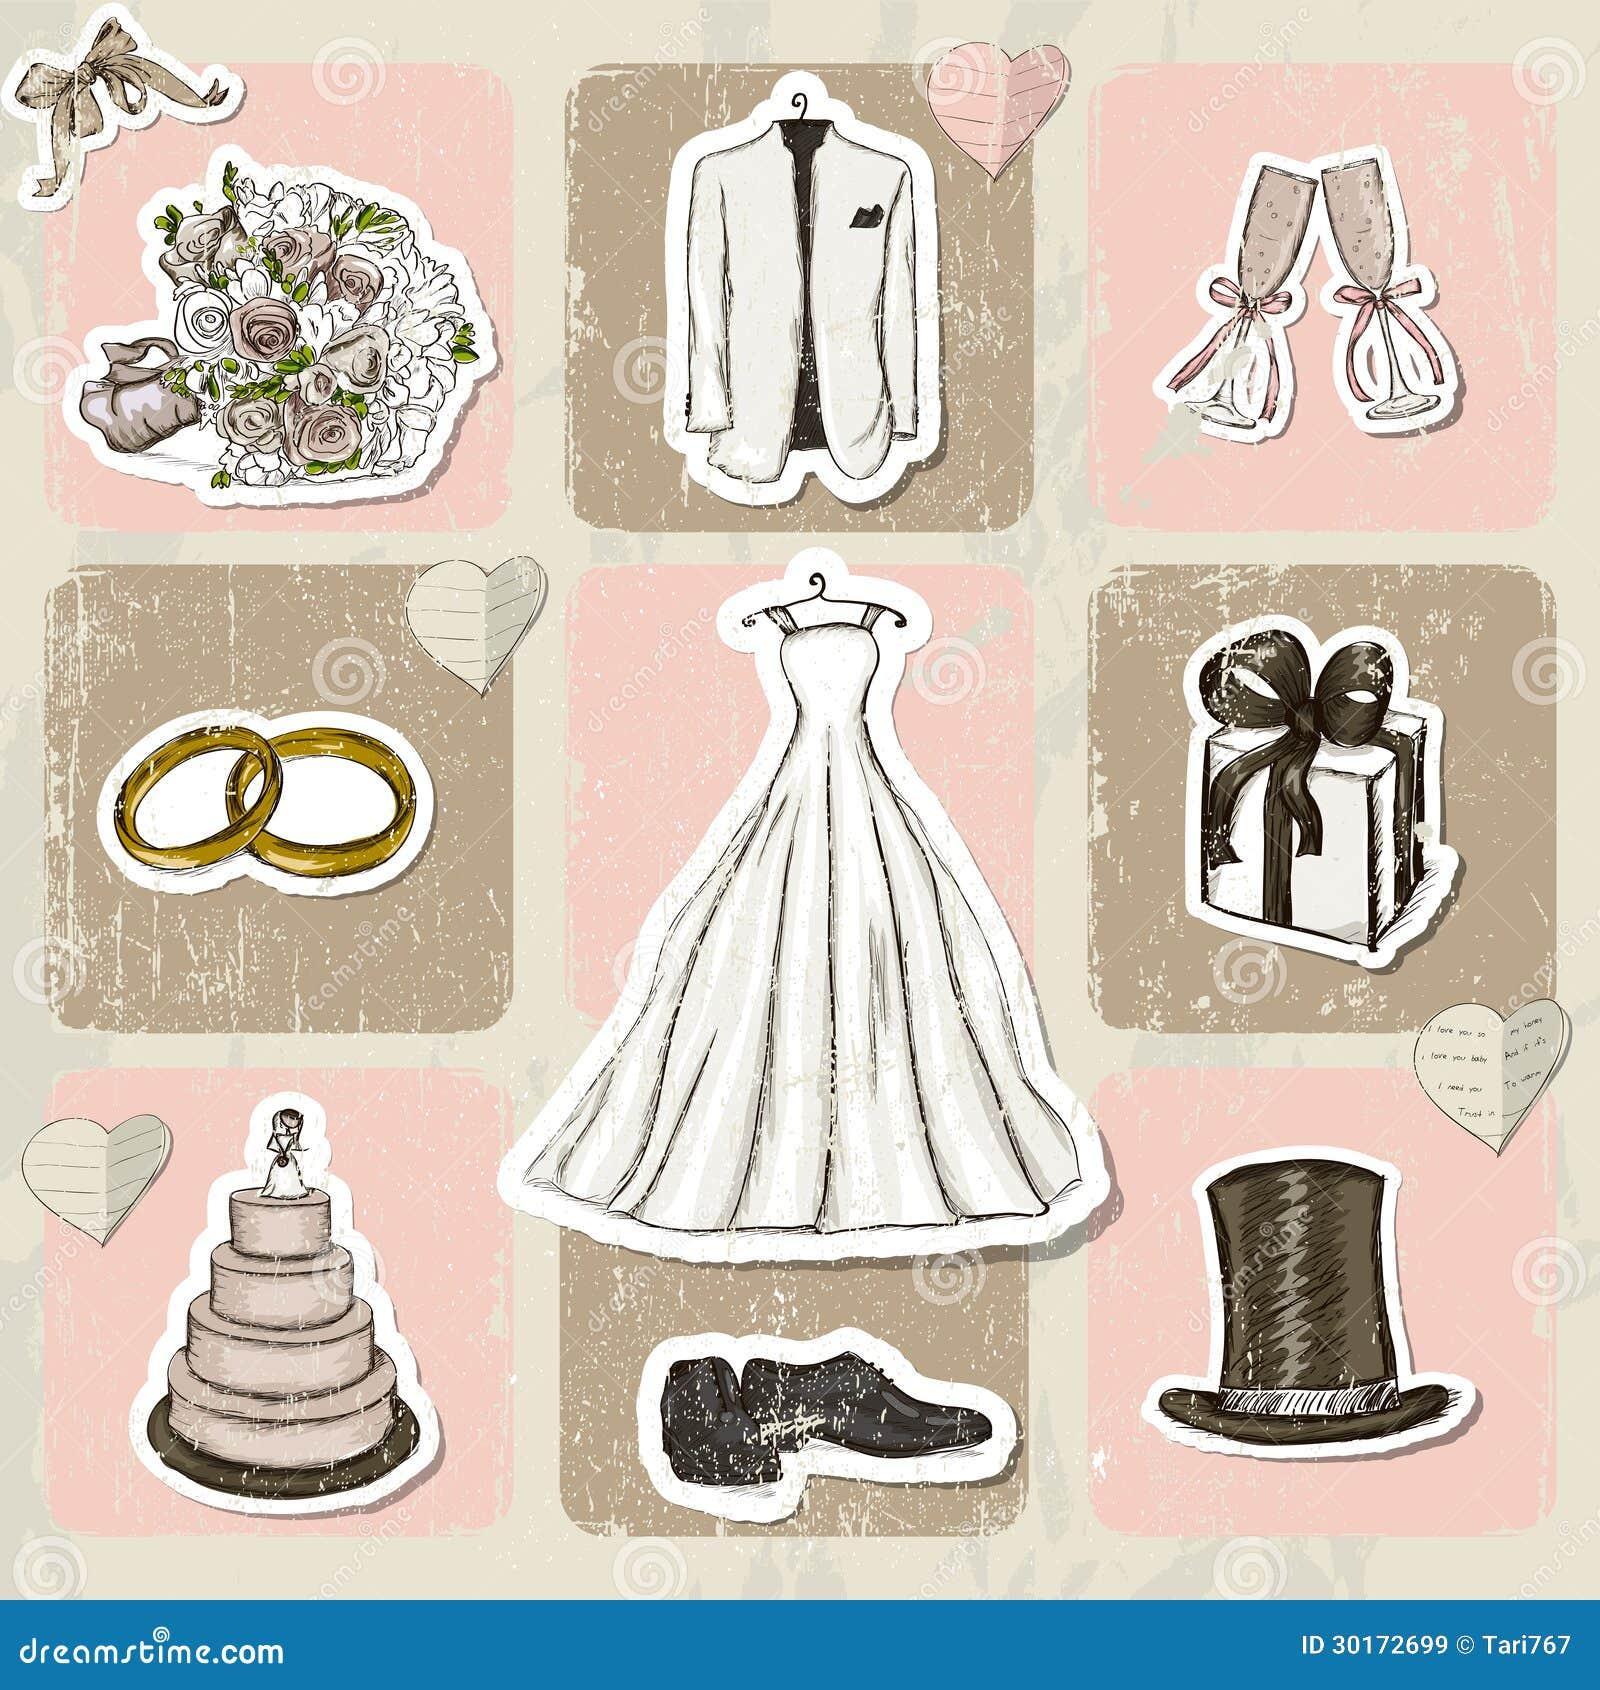 Retro Beach Illustration Royalty Free Stock Photo: Vintage Wedding Poster. Royalty Free Stock Images